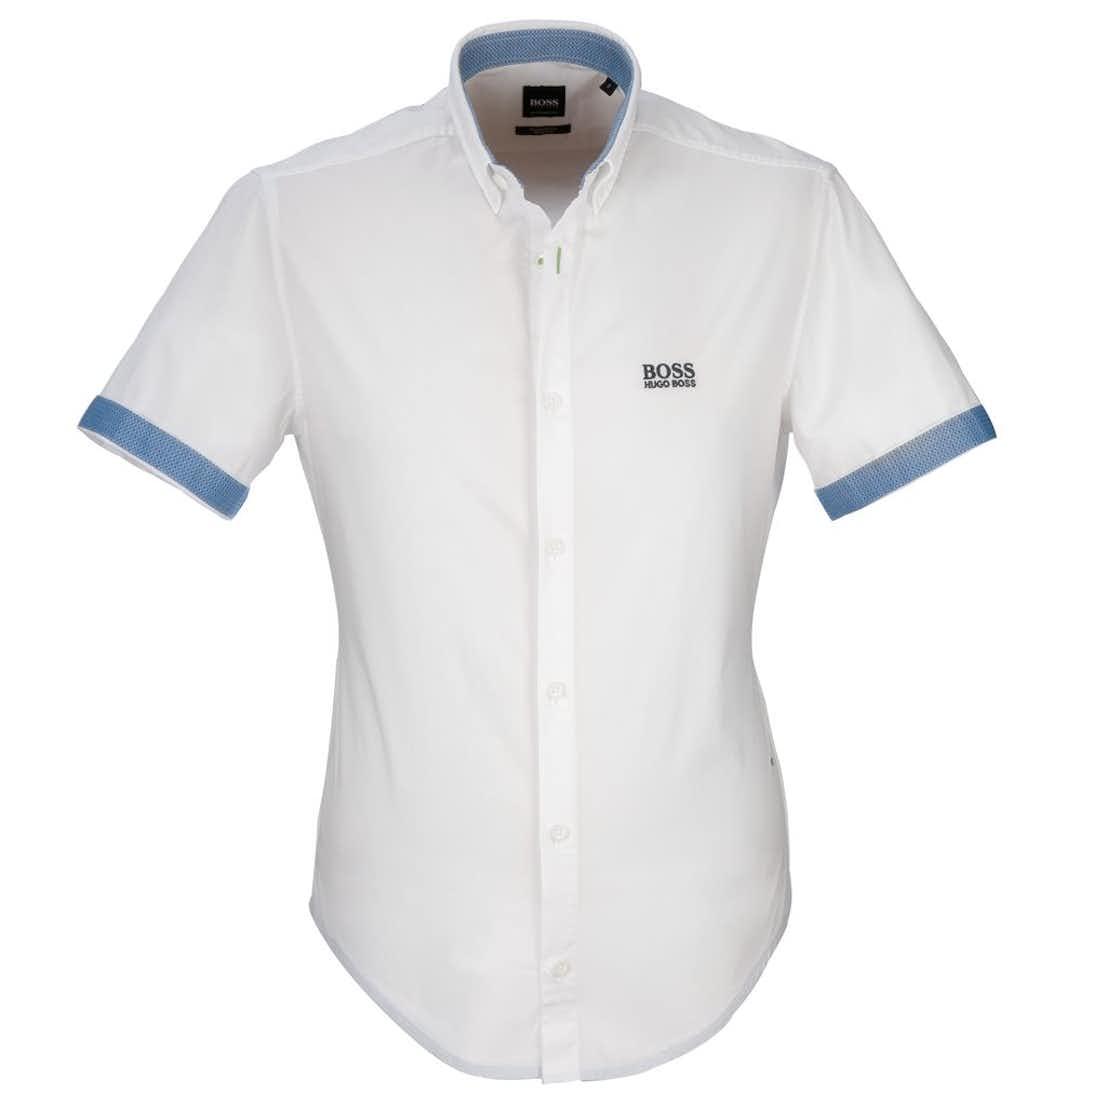 The Open BOSS Short-Sleeve Shirt - White